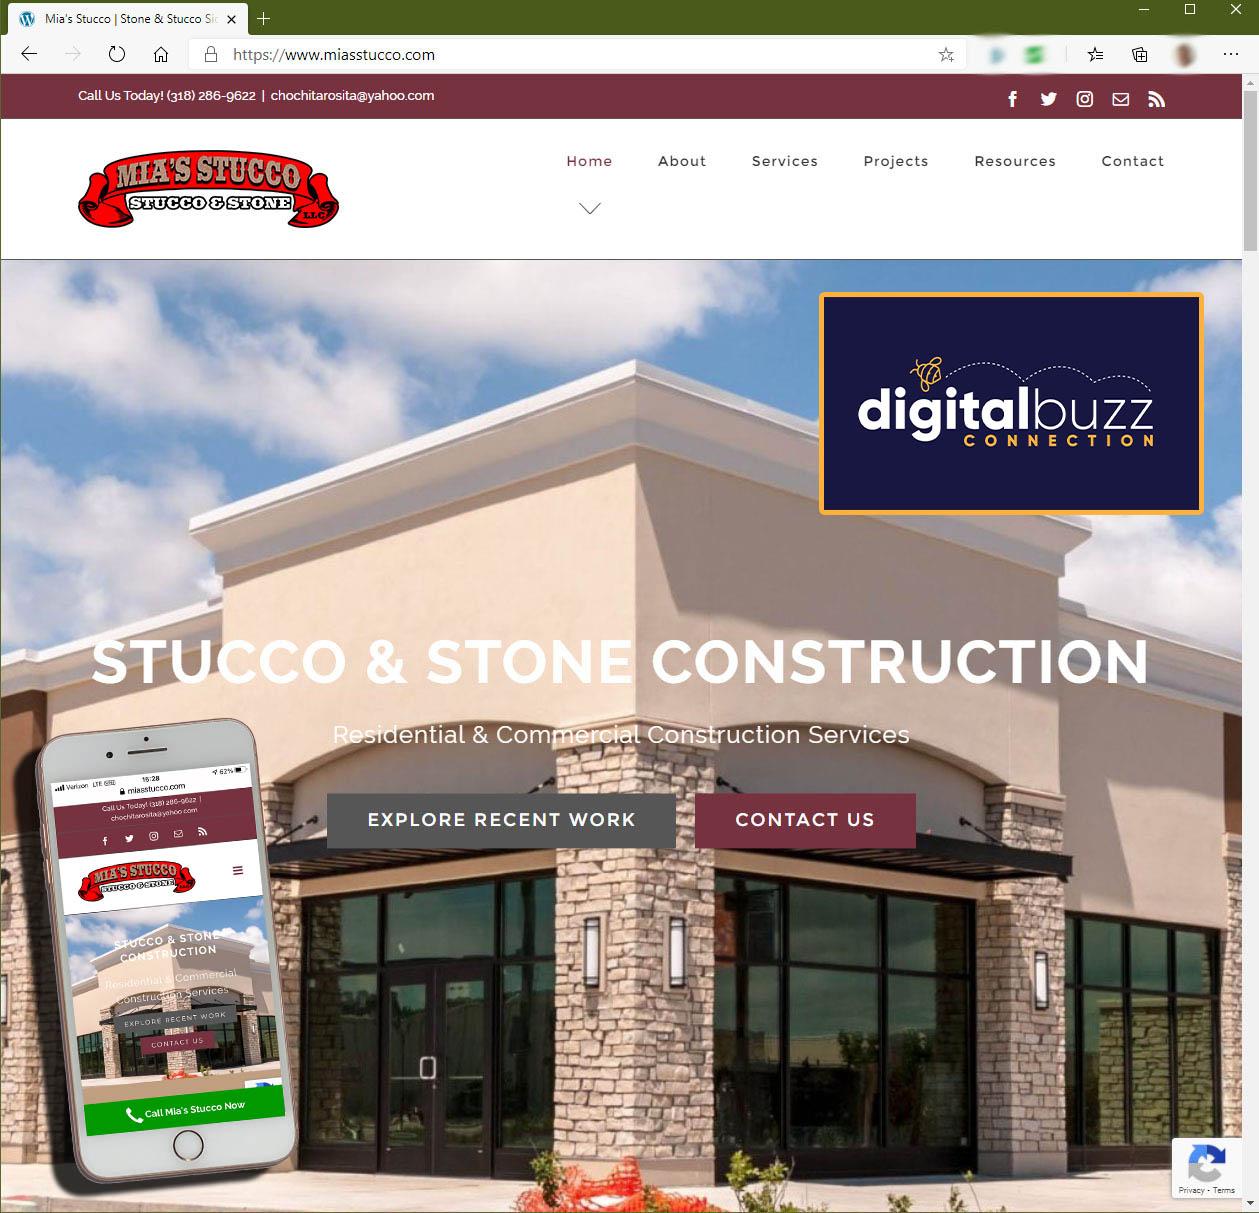 Mia's Stucco & Stone Construction